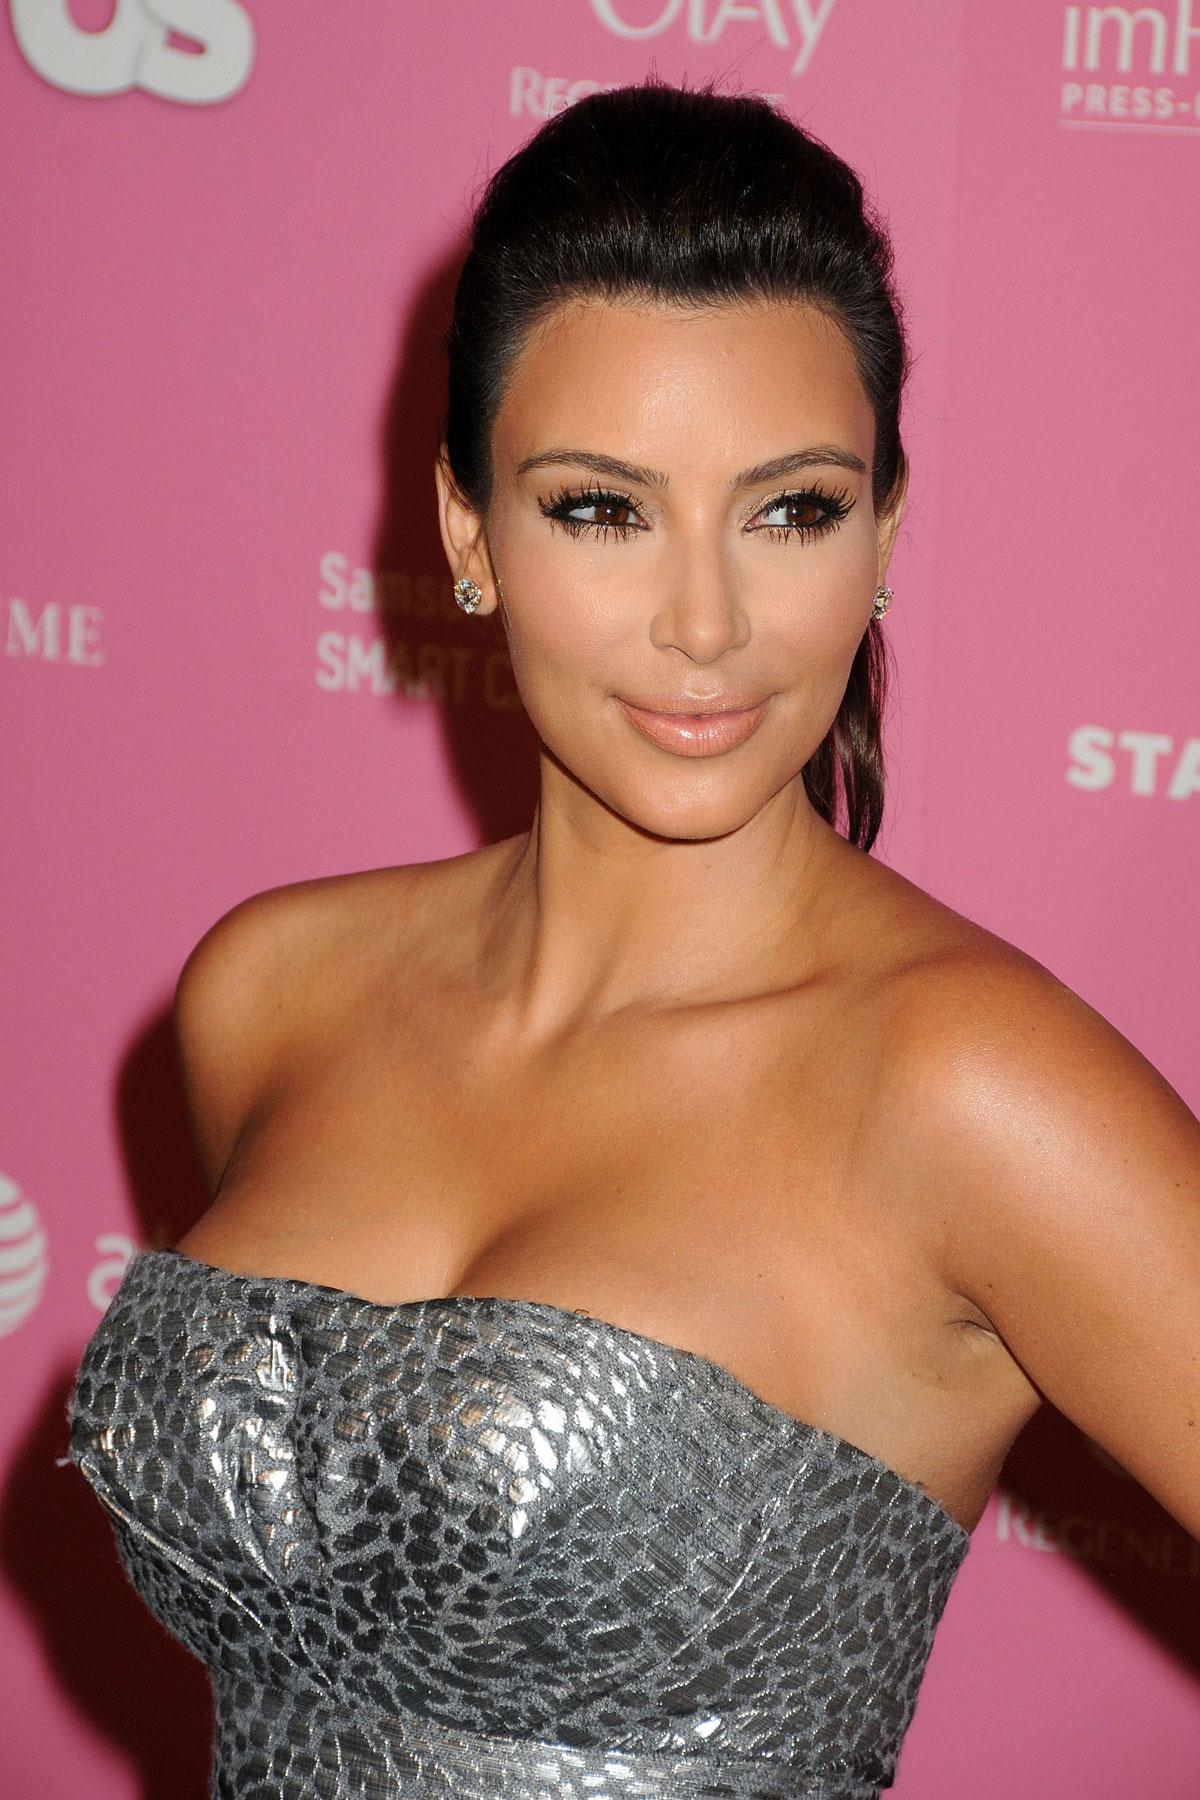 KIM KARDASHIAN at Us W... Kim Kardashian